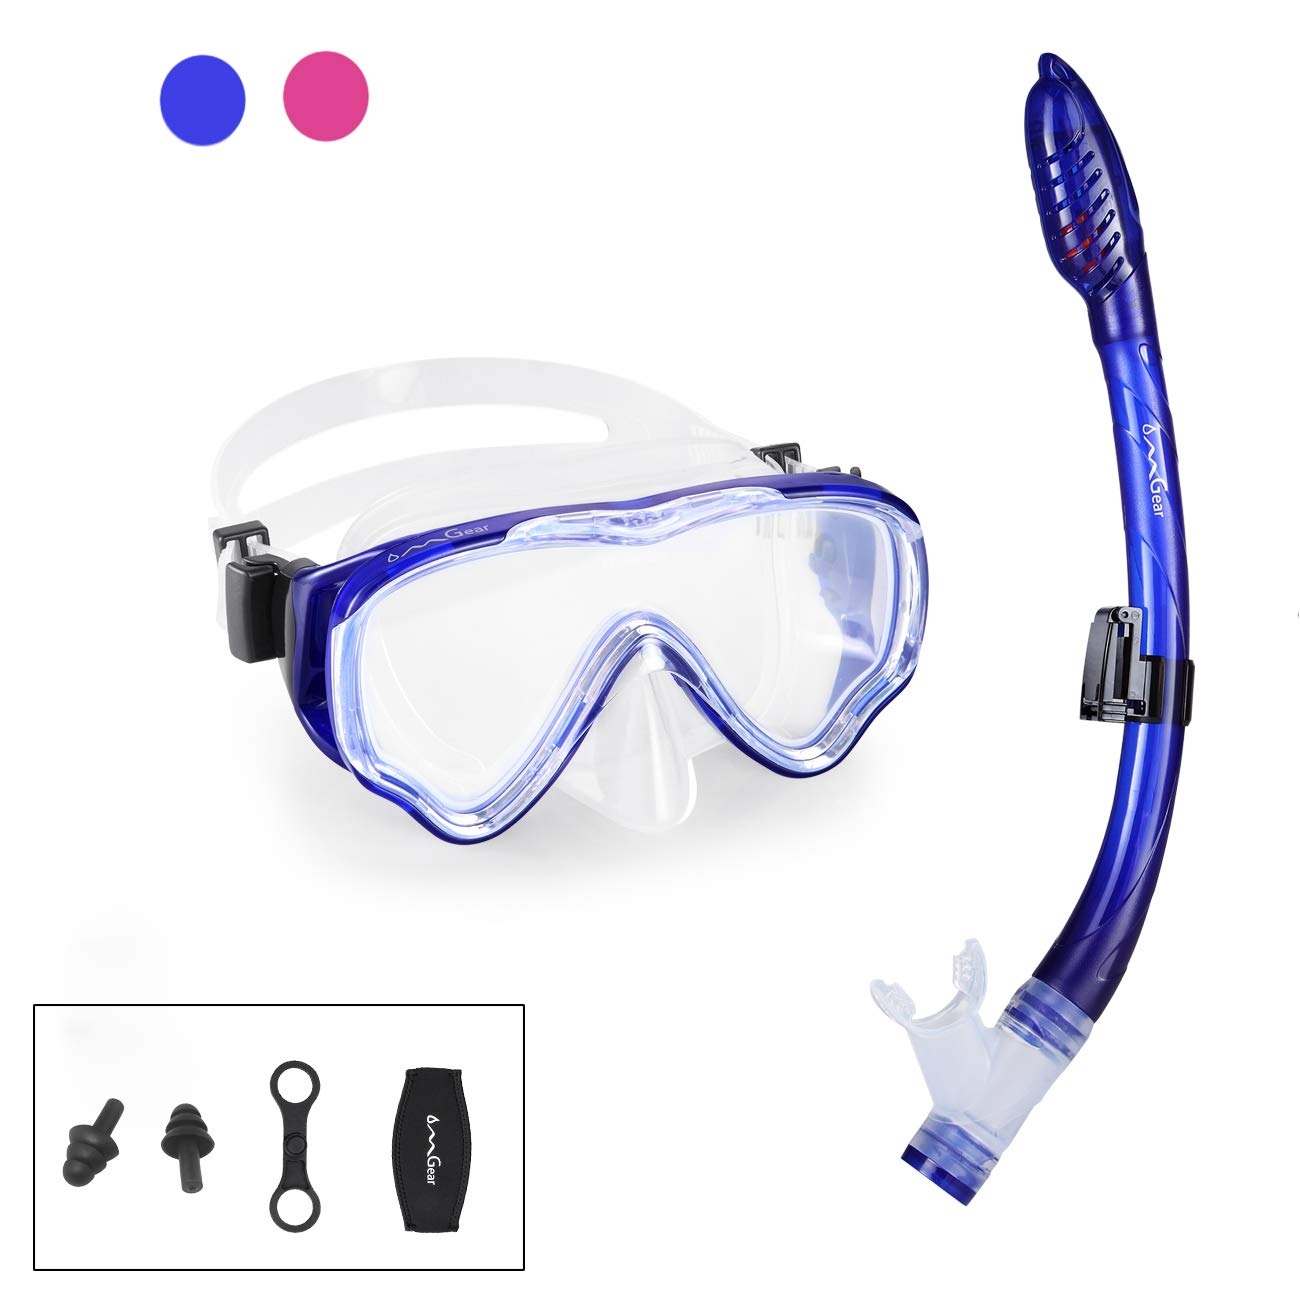 Kid Snorkel Set Snorkeling Gear Dive Mask Snorkel Diving Goggles Dry Top Anti-Fog Anti-Leak Panoramic View Easy Breathing Swim Gear Neoprene Mask Strap Cover Scuba Swimming Underwater(Blue-Kid ... by OMGear